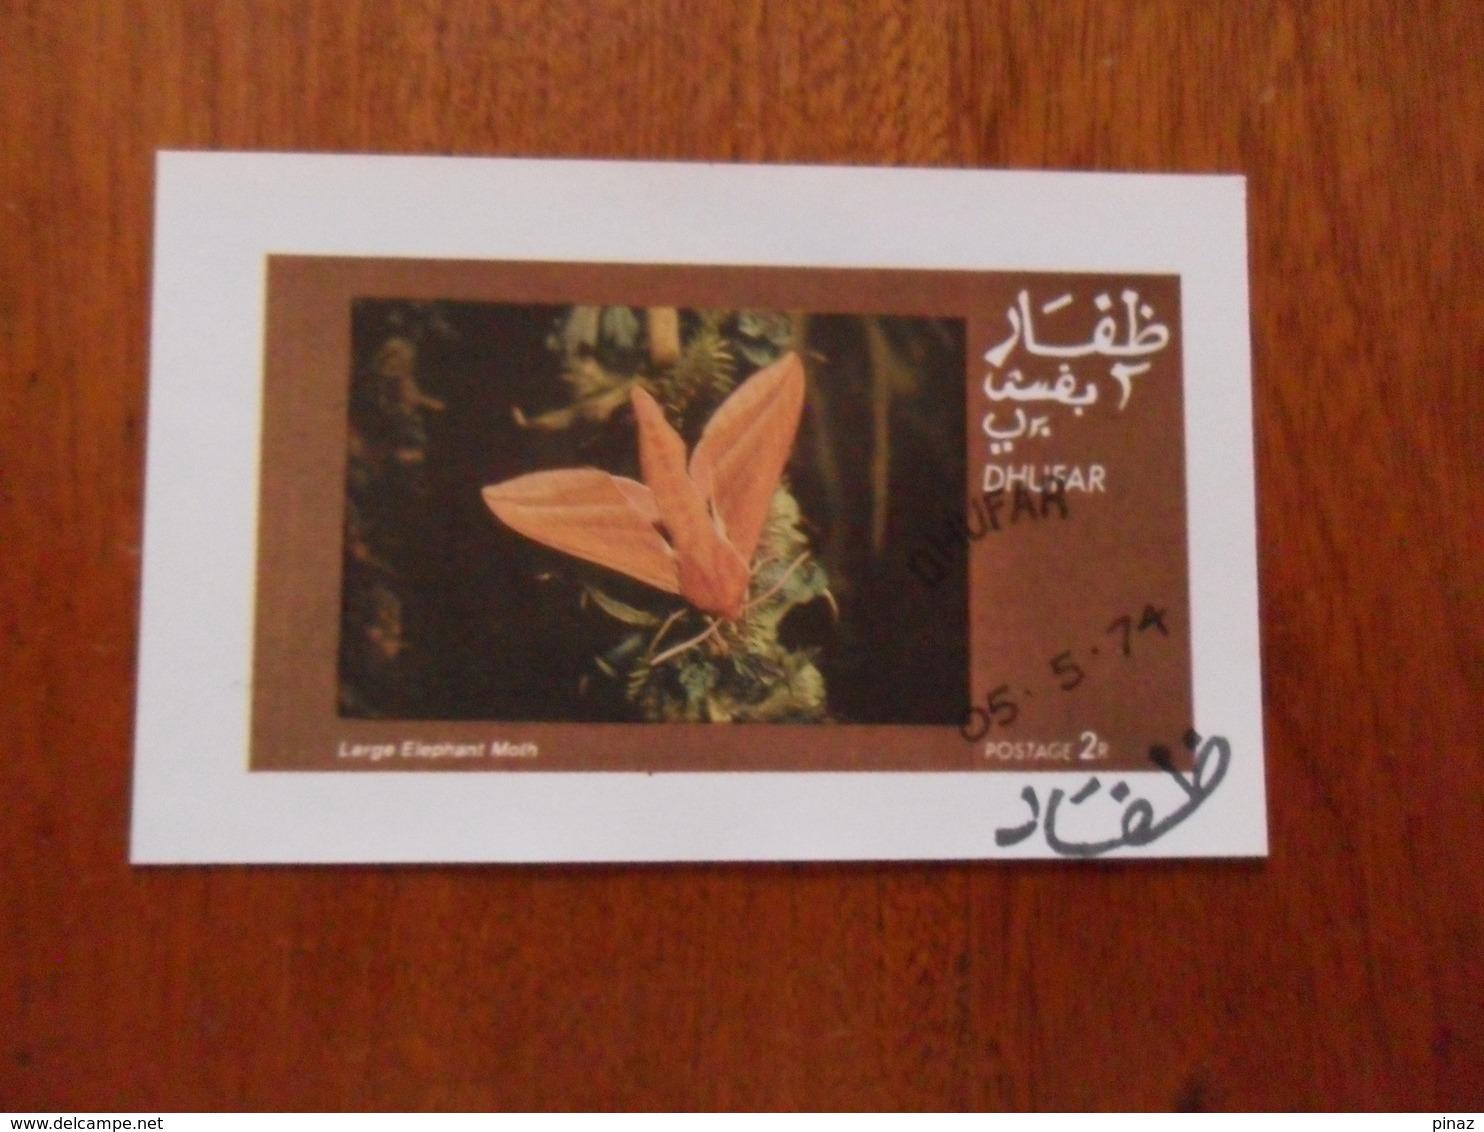 DHUFAR Tematica FARFALLE - Farfalle